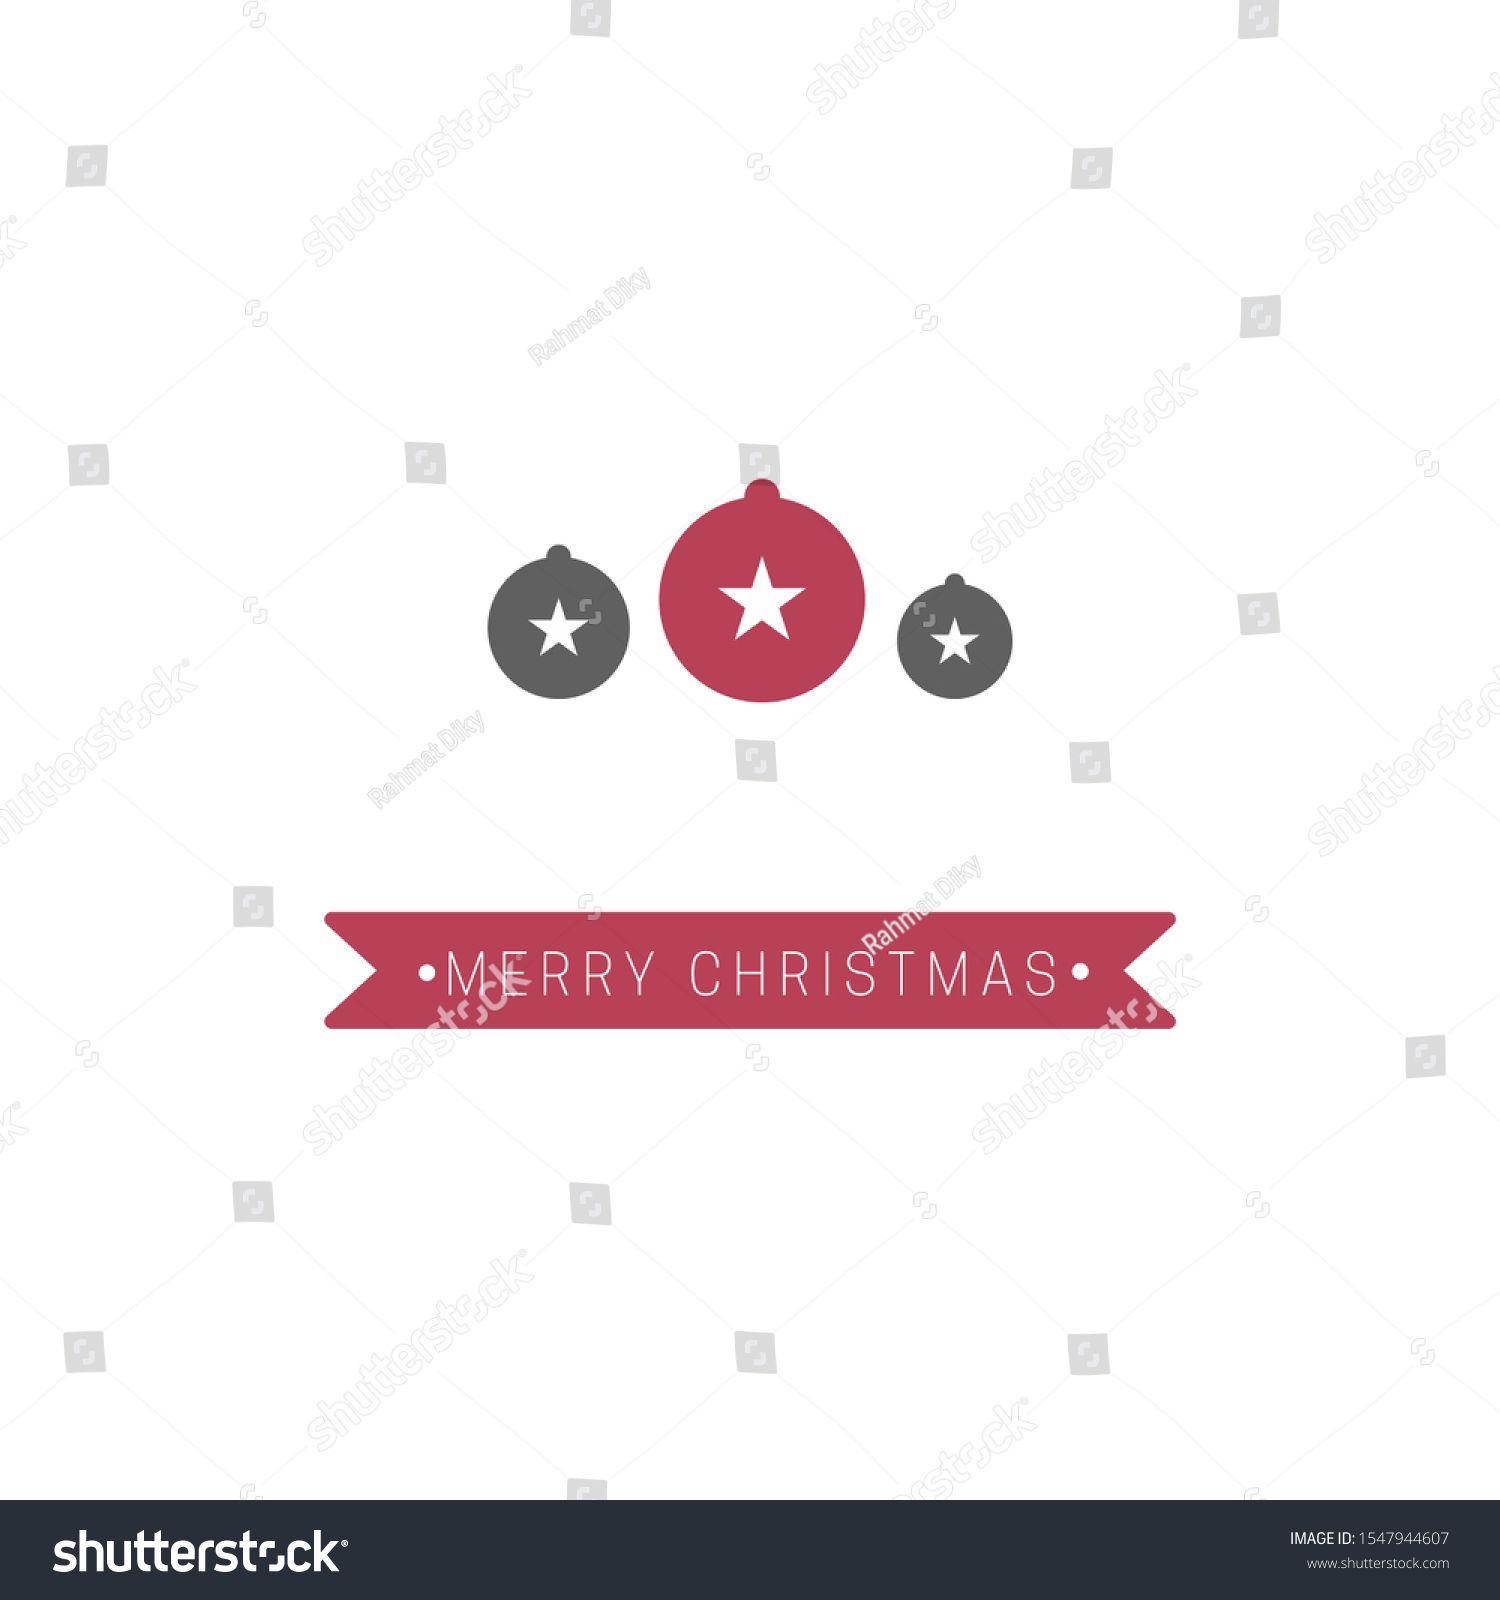 Christmas And New Year Logo Design Ad Affiliate Year Christmas Design Logo New Year Logo Restaurant Website Templates Logo Design